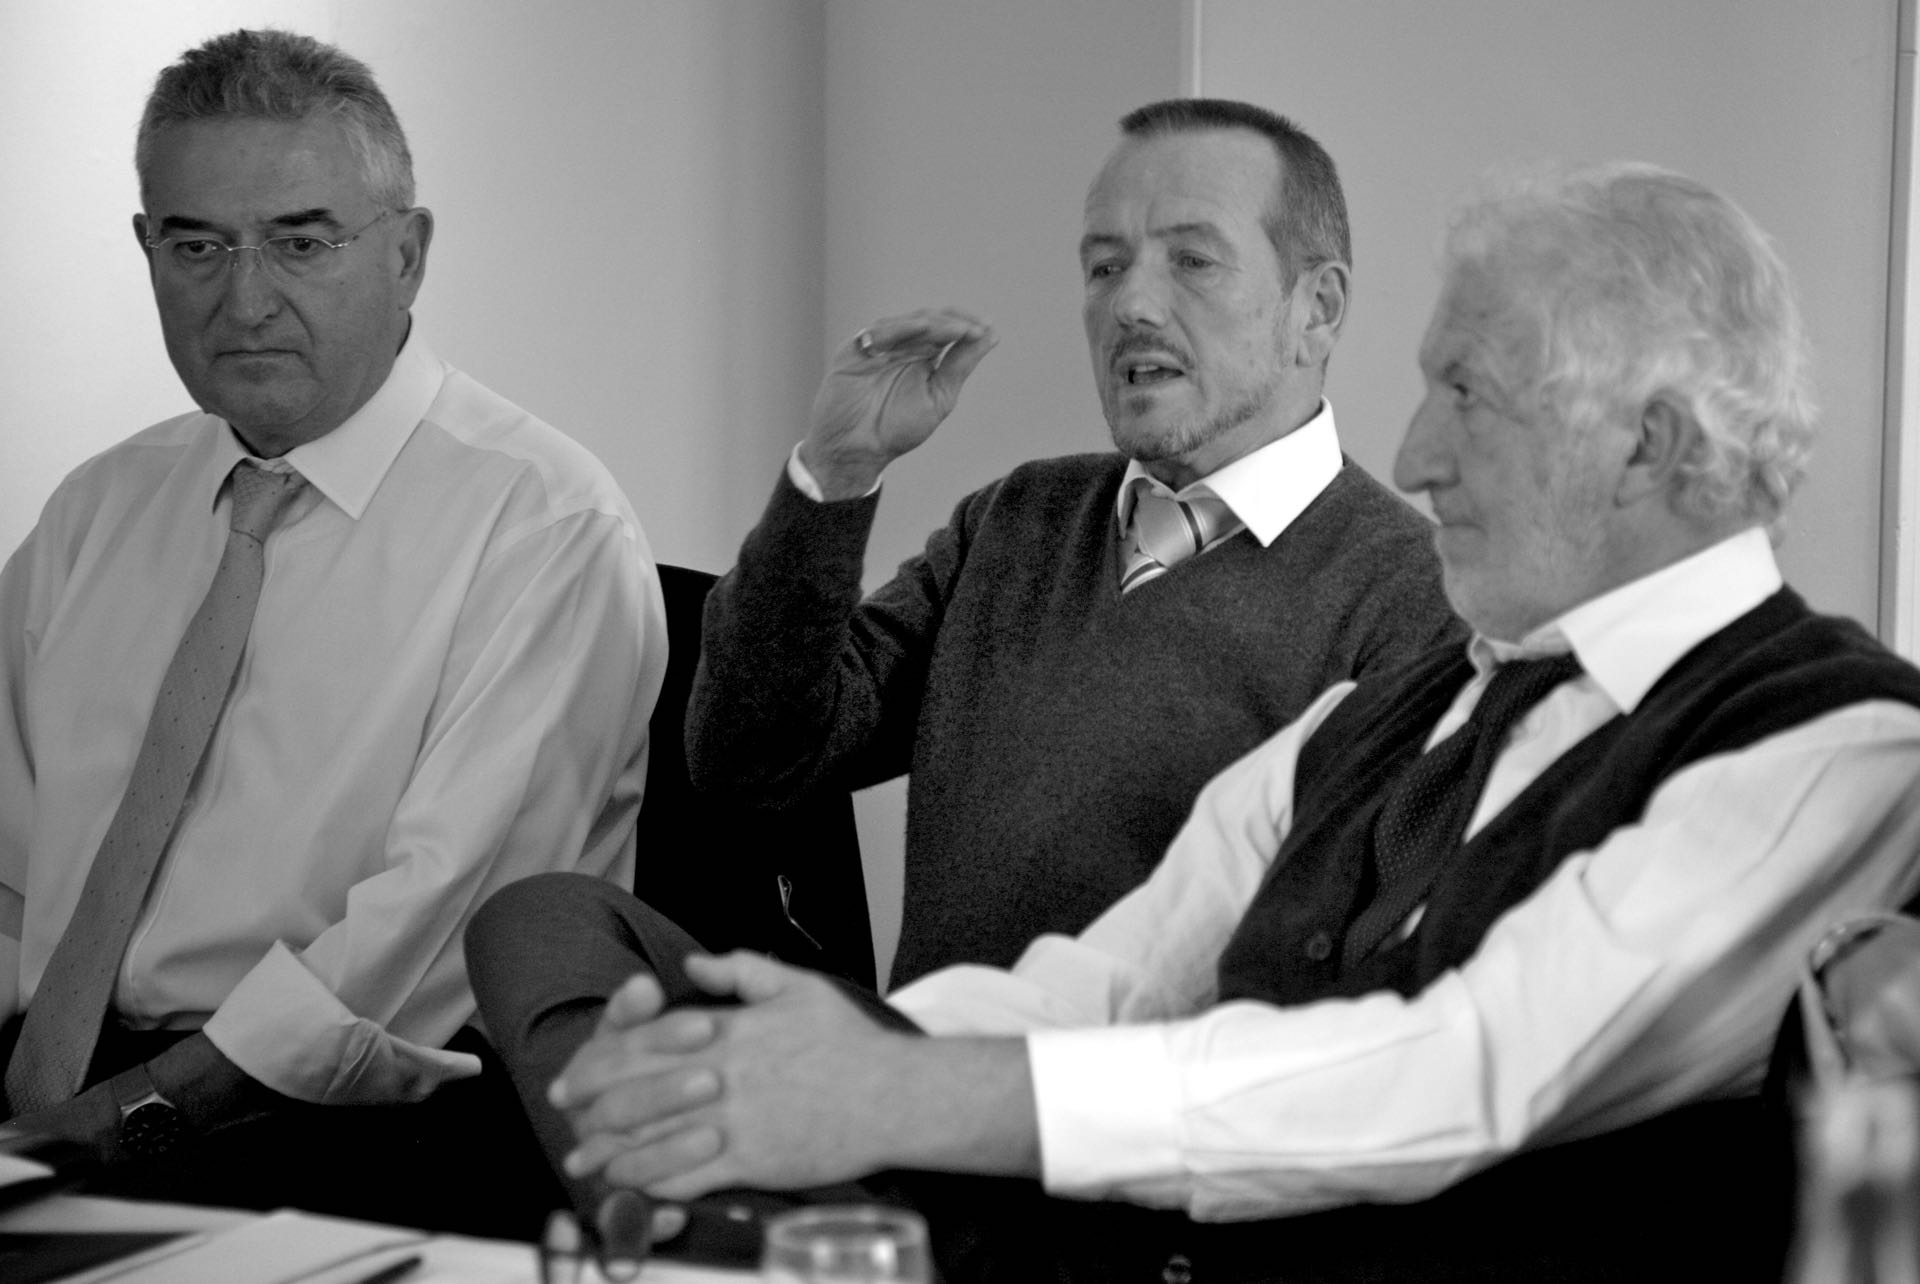 EREN Meeting 11-2017 in Bordeaux, France  - 3.jpg